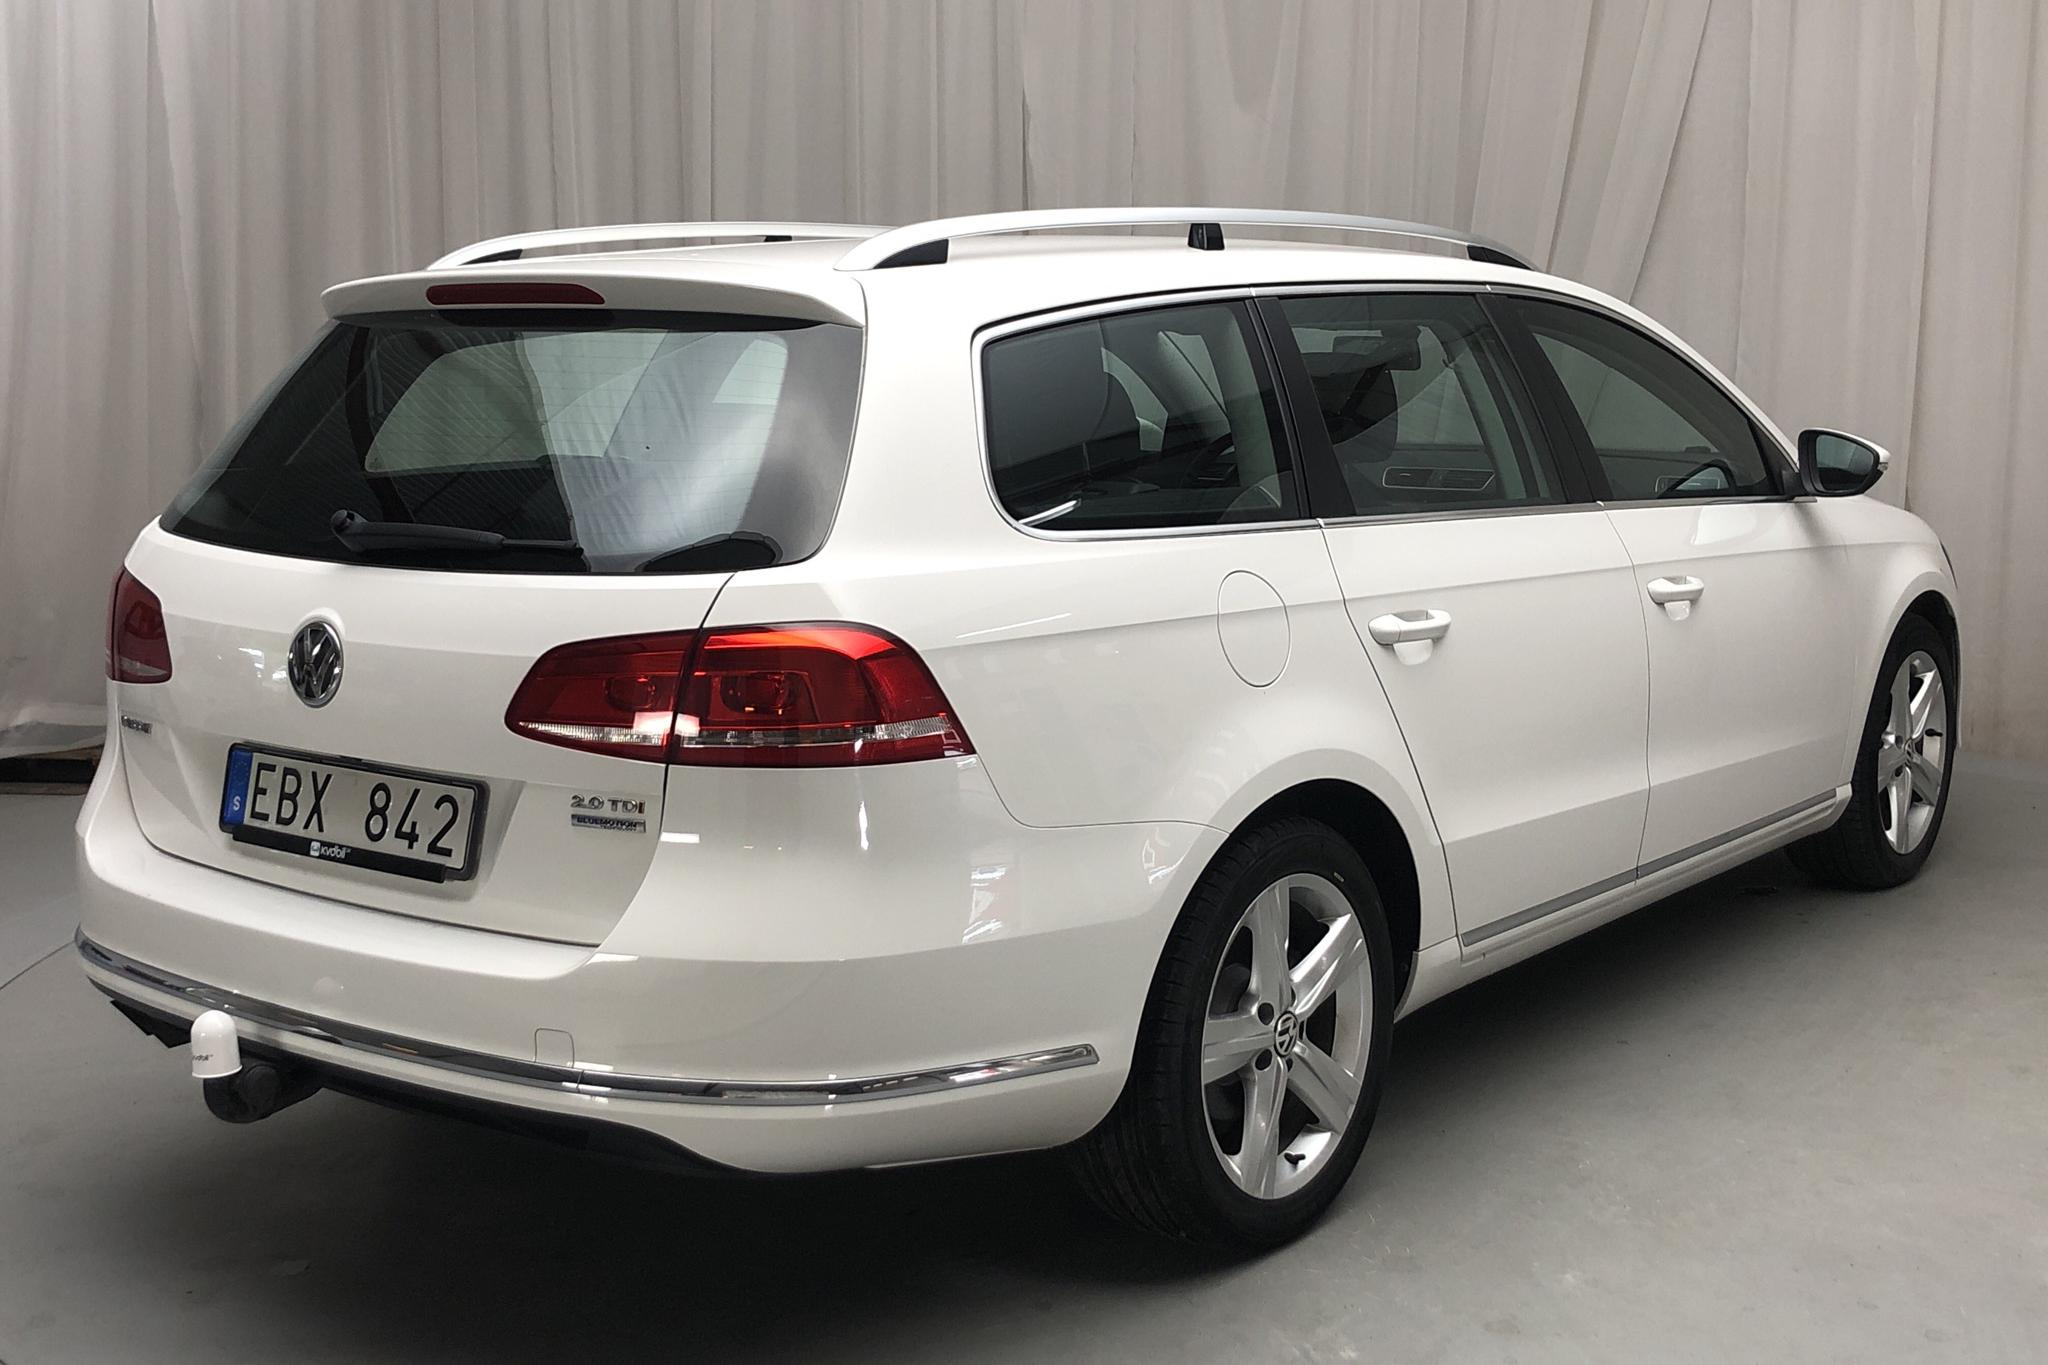 VW Passat 2.0 TDI BlueMotion Technology Variant (177hk) - 84 410 km - Automatic - white - 2014